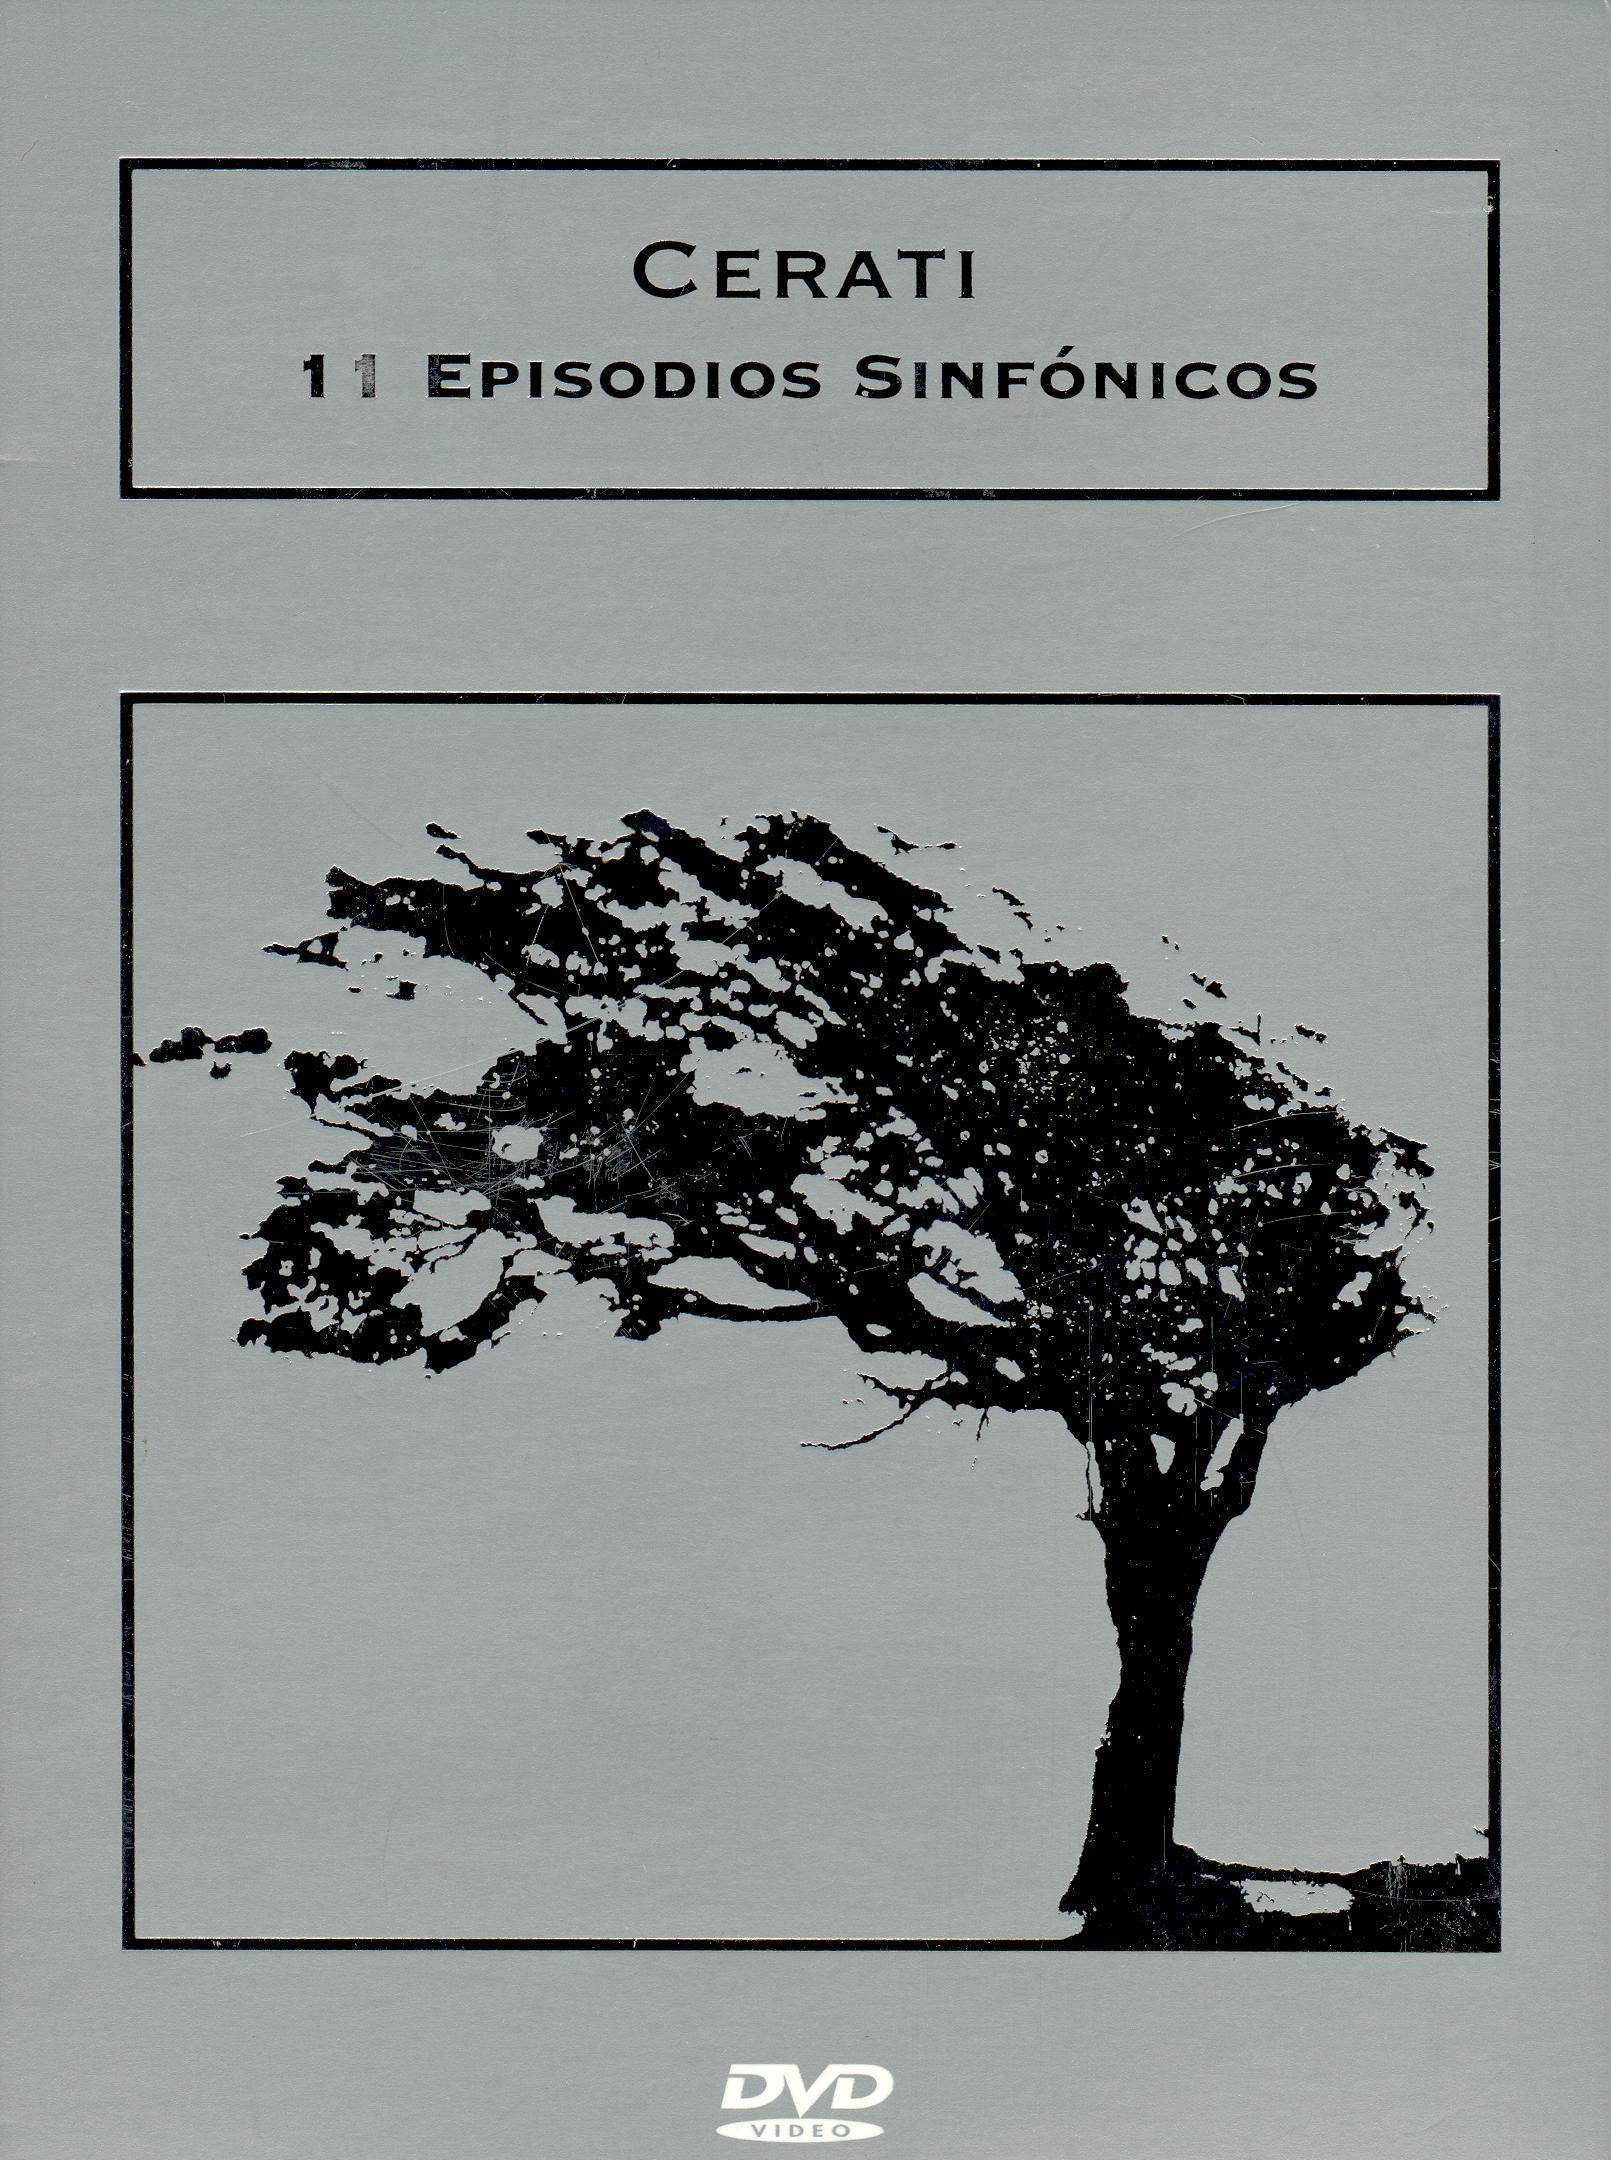 Gustavo Cerati: 11 Episodios Sinfonicos